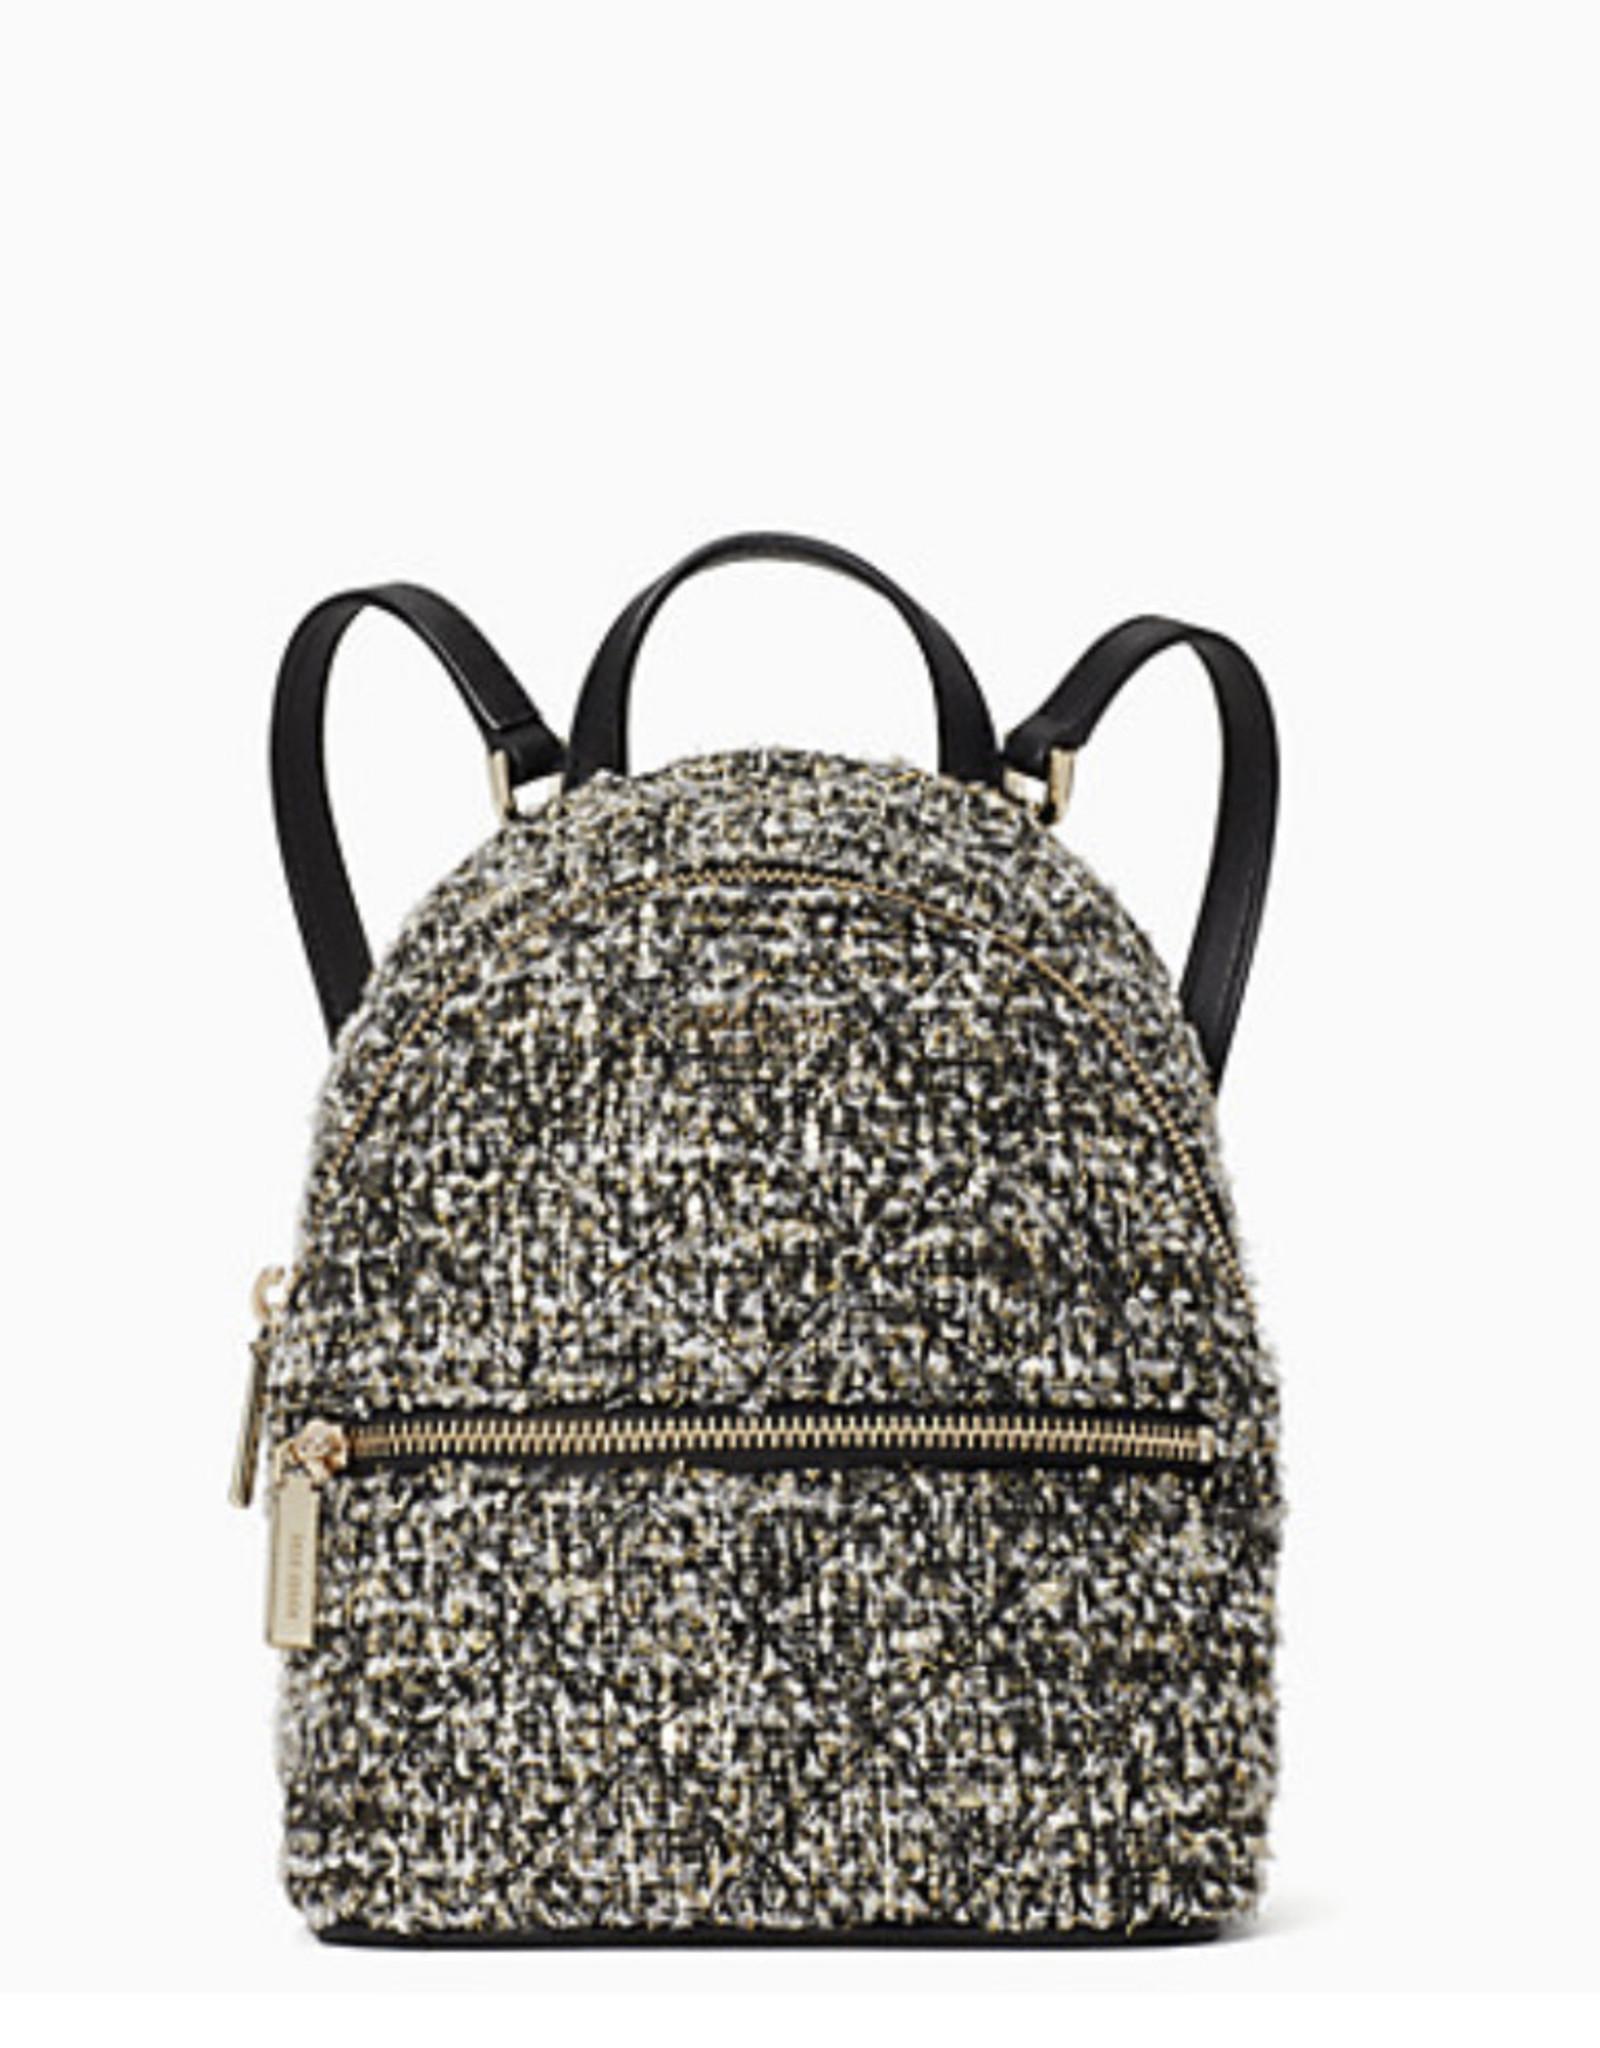 Kate Spade Kate Spade Mini Convertible Backpack Natalia Tweed